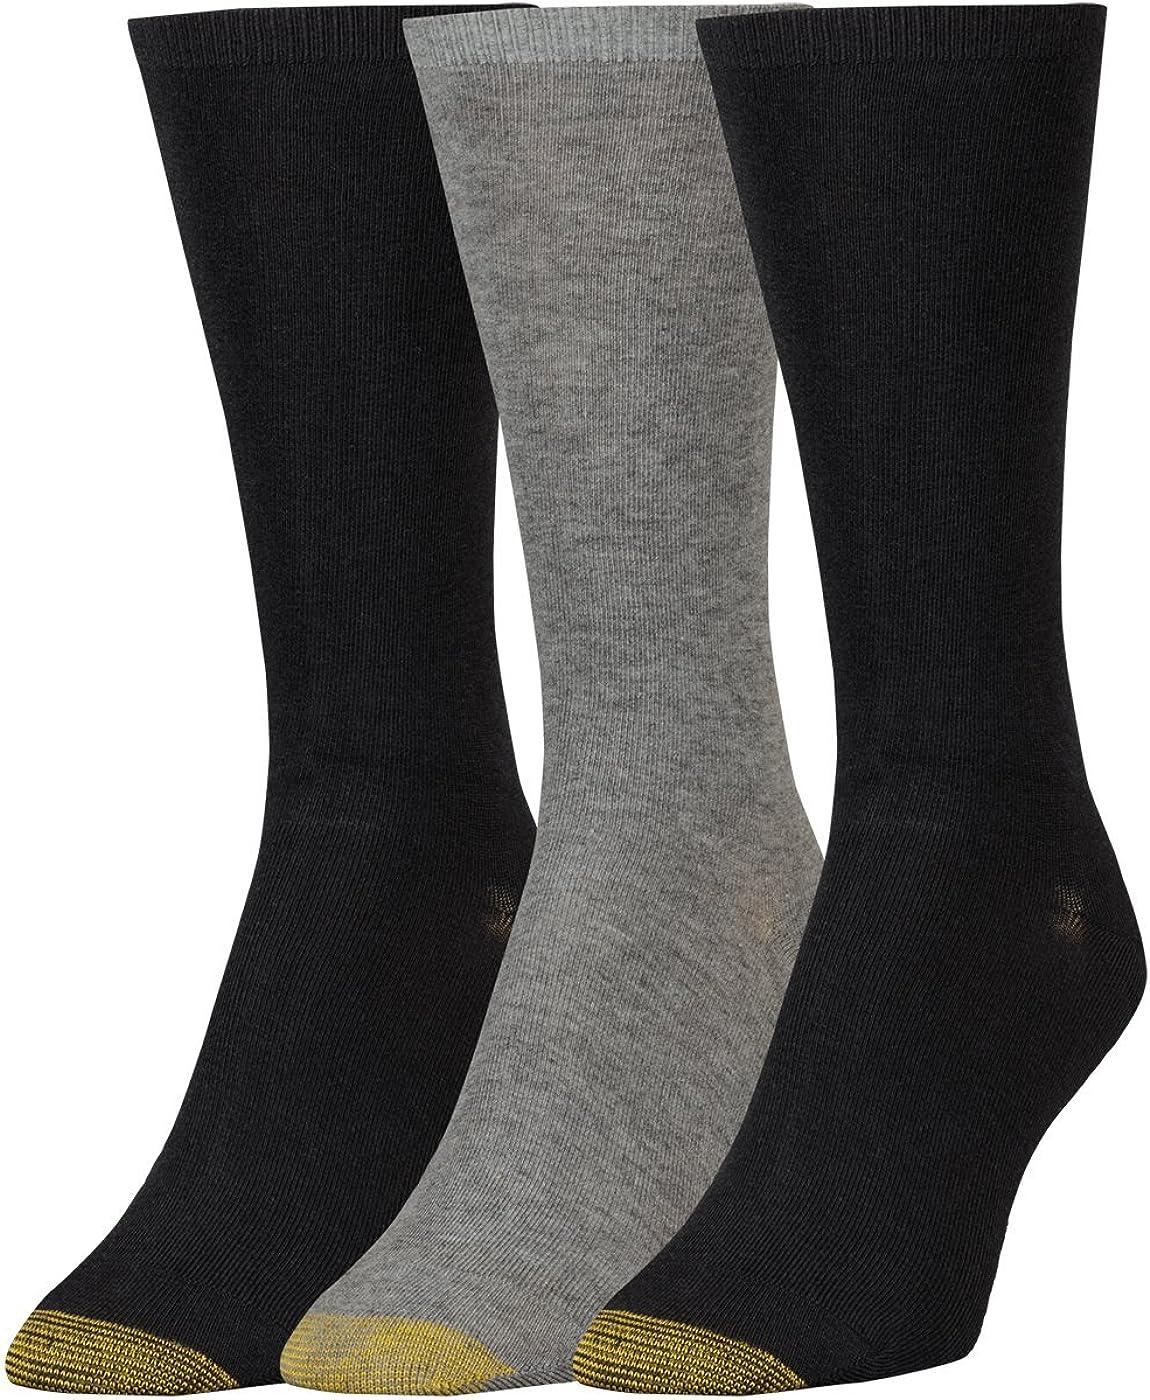 Gold Toe Women's Non-Binding Flat Knit Crew Socks|,| 3-Pairs